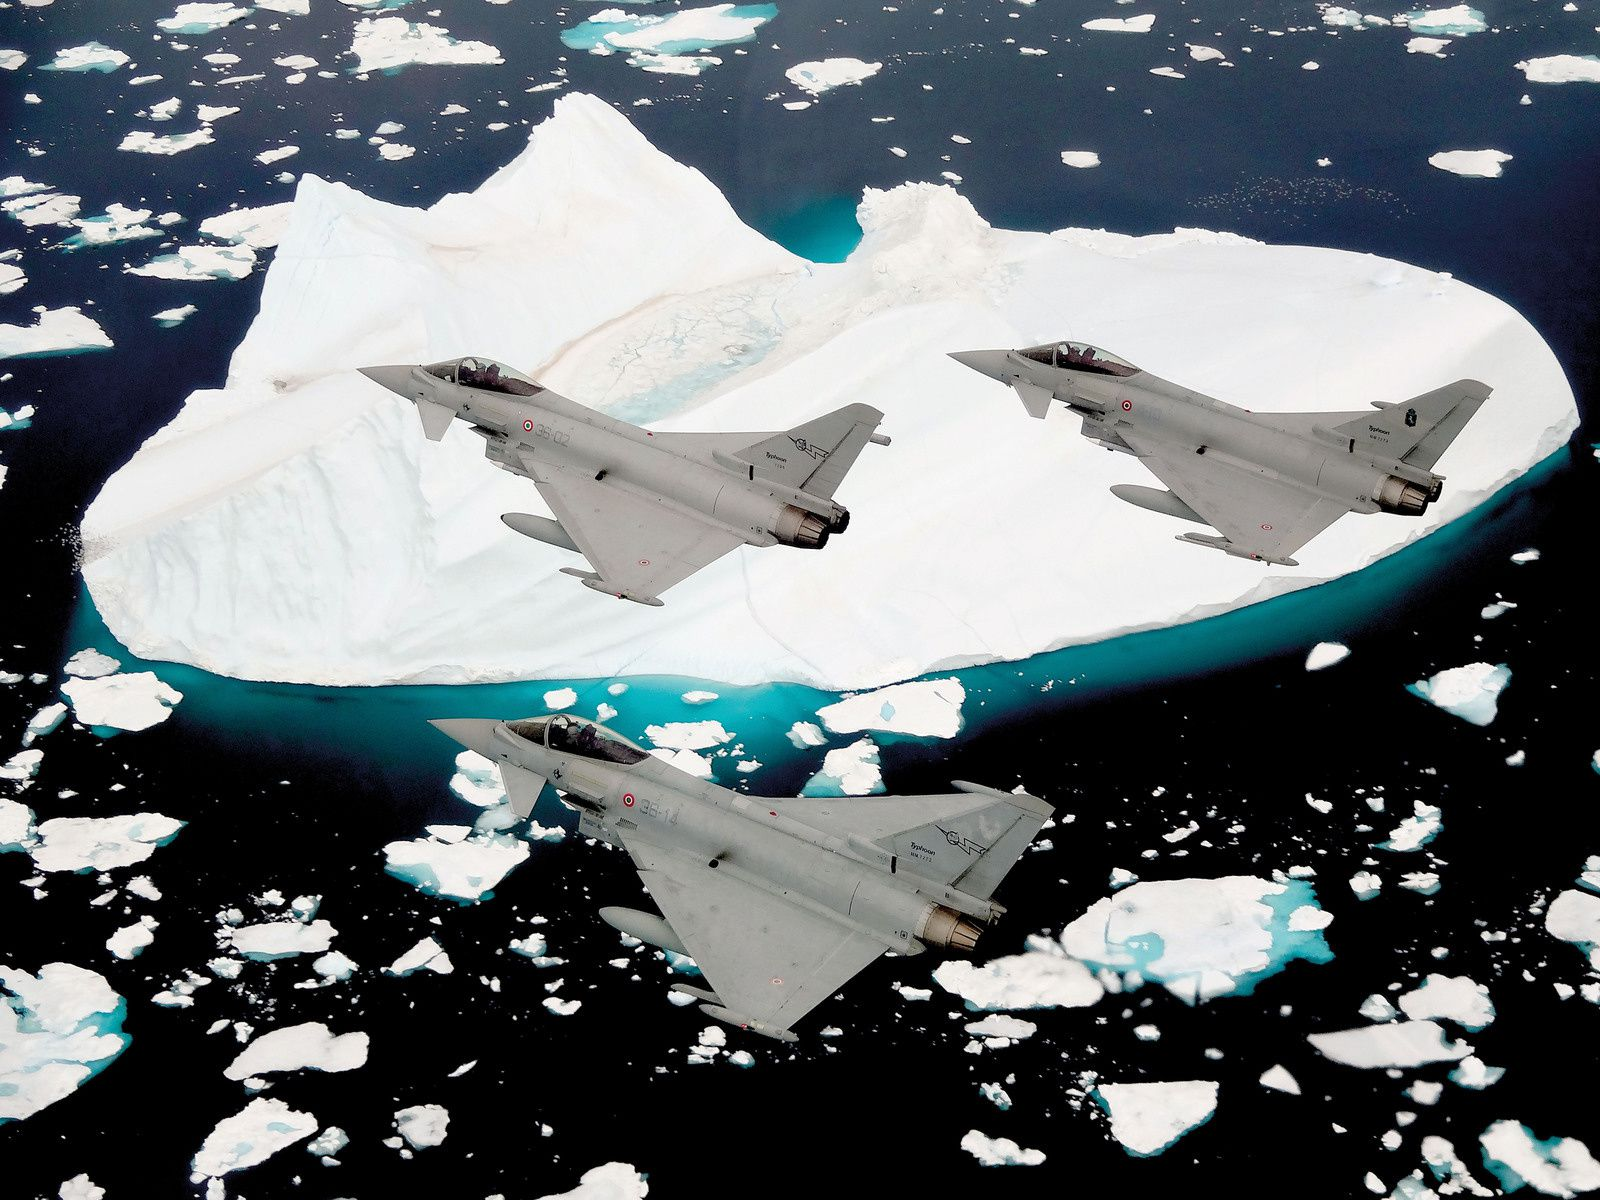 L'Aeronautica Militare déploie six Eurofighter Typhoon en Islande